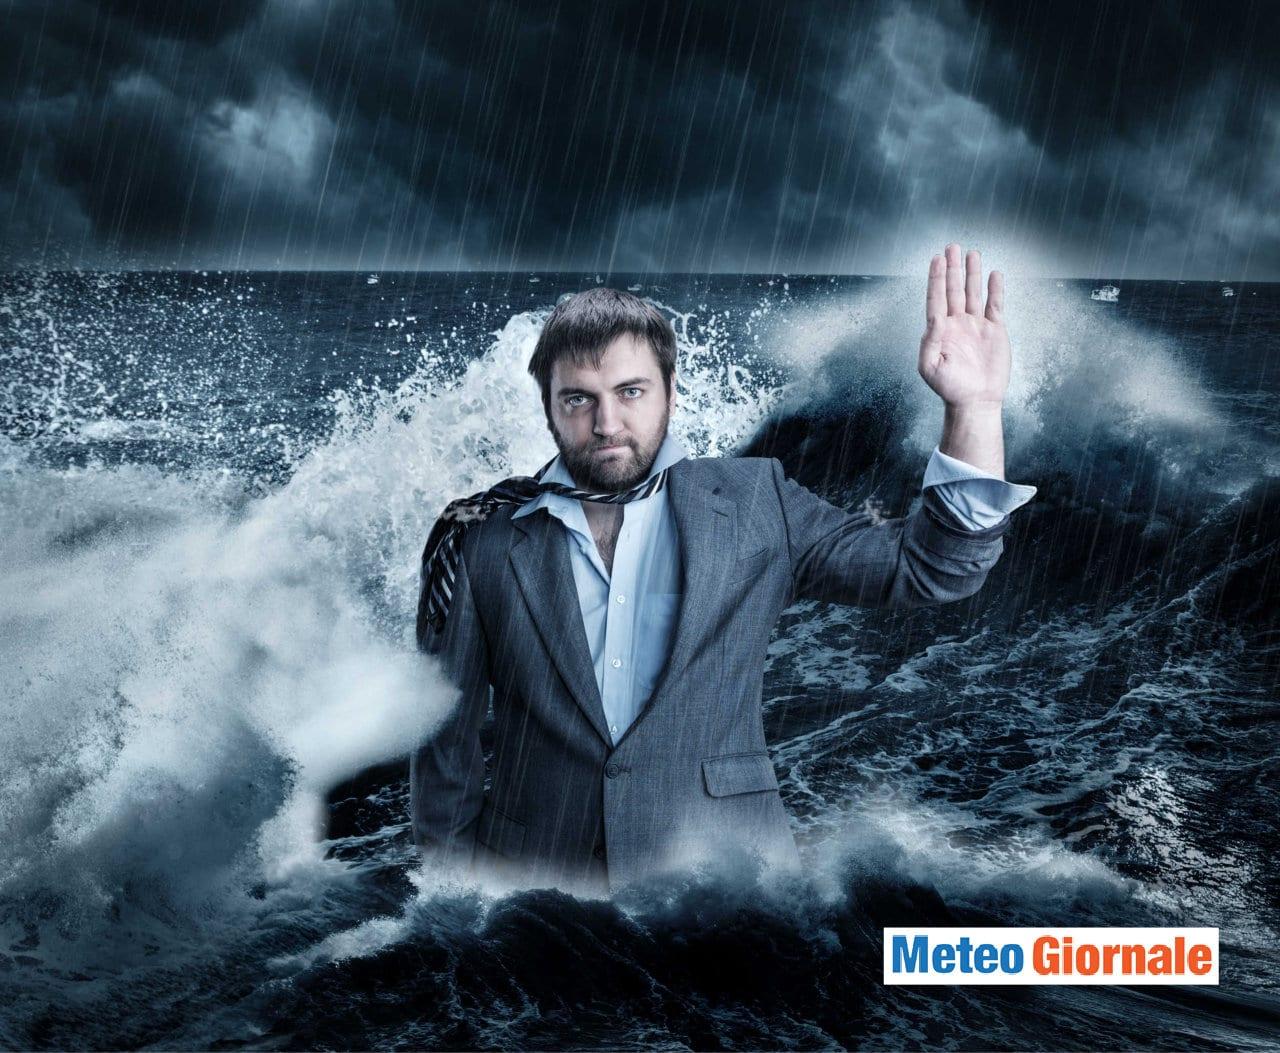 estremizzazione meteo - L'estremizzazione meteo climatica ci sta affondando